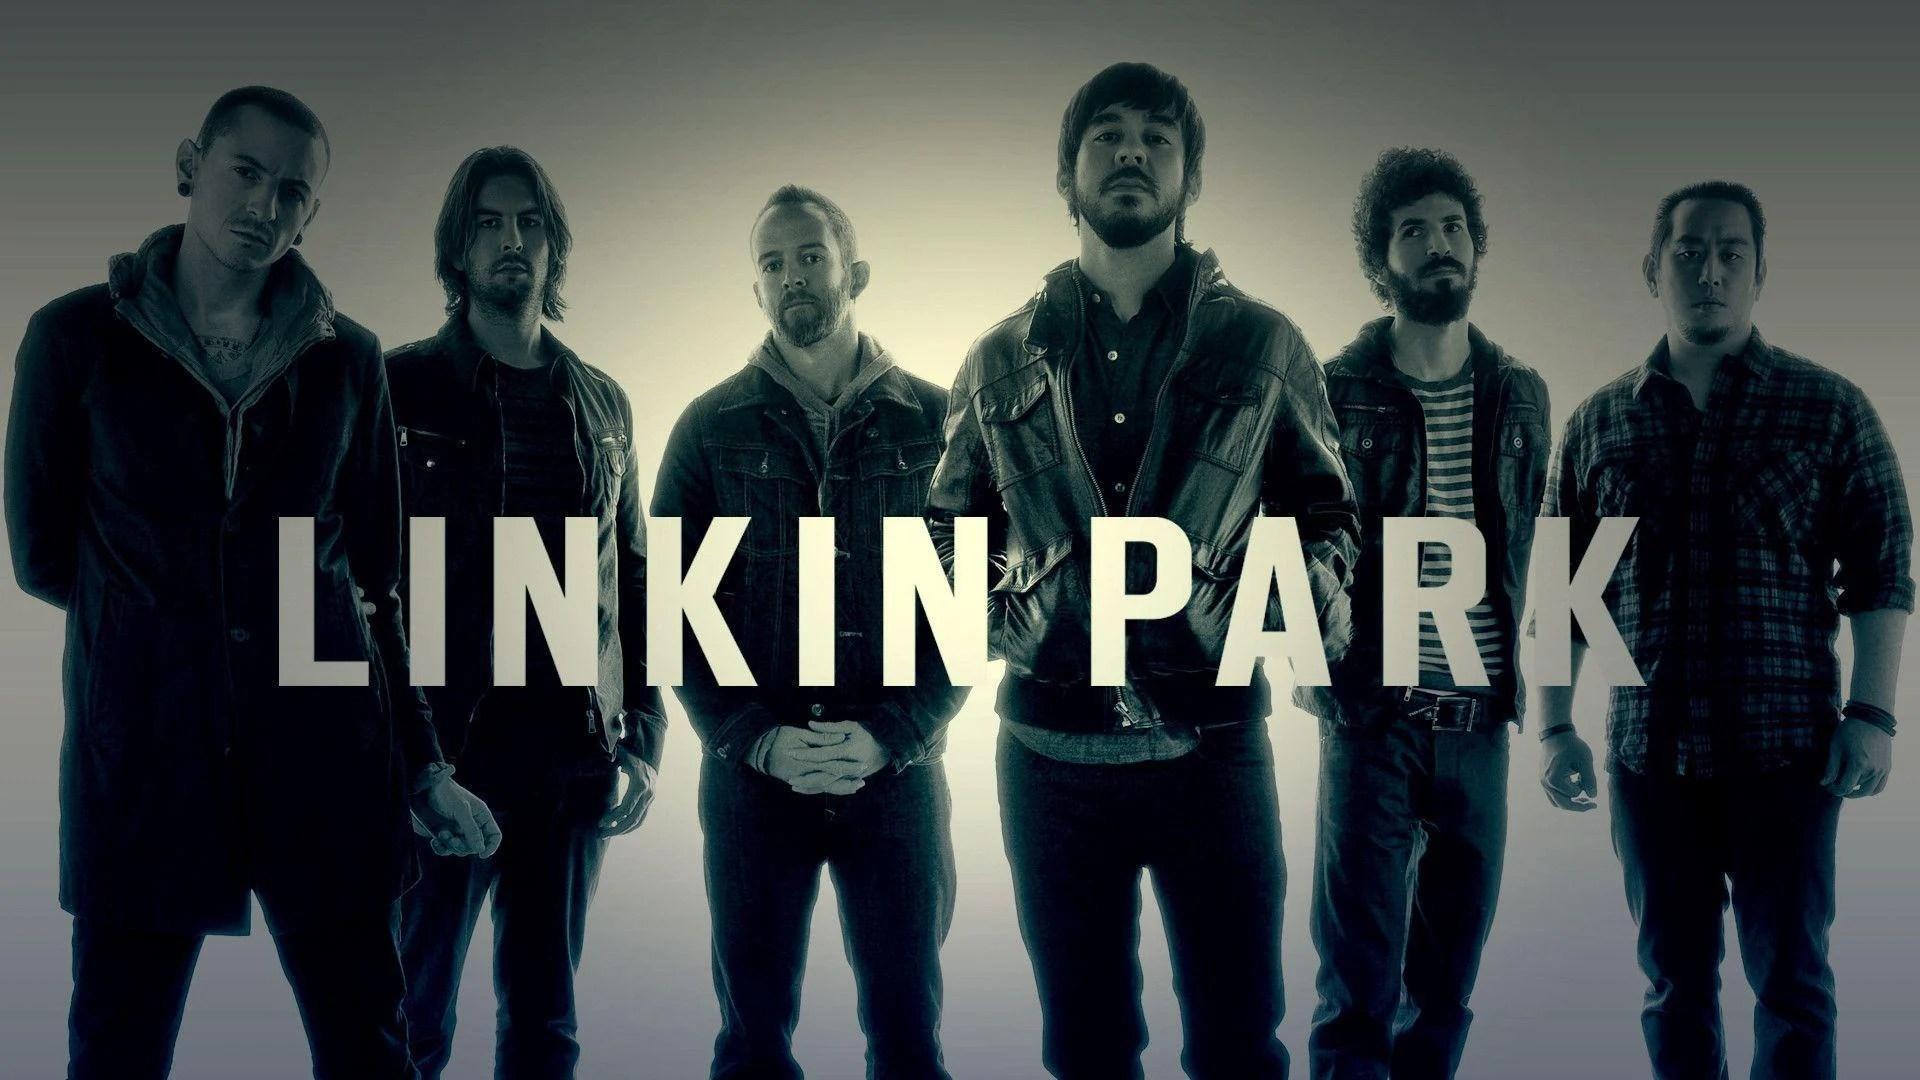 Linkin Park Wallpapers HD 2015 Wallpaper Cave